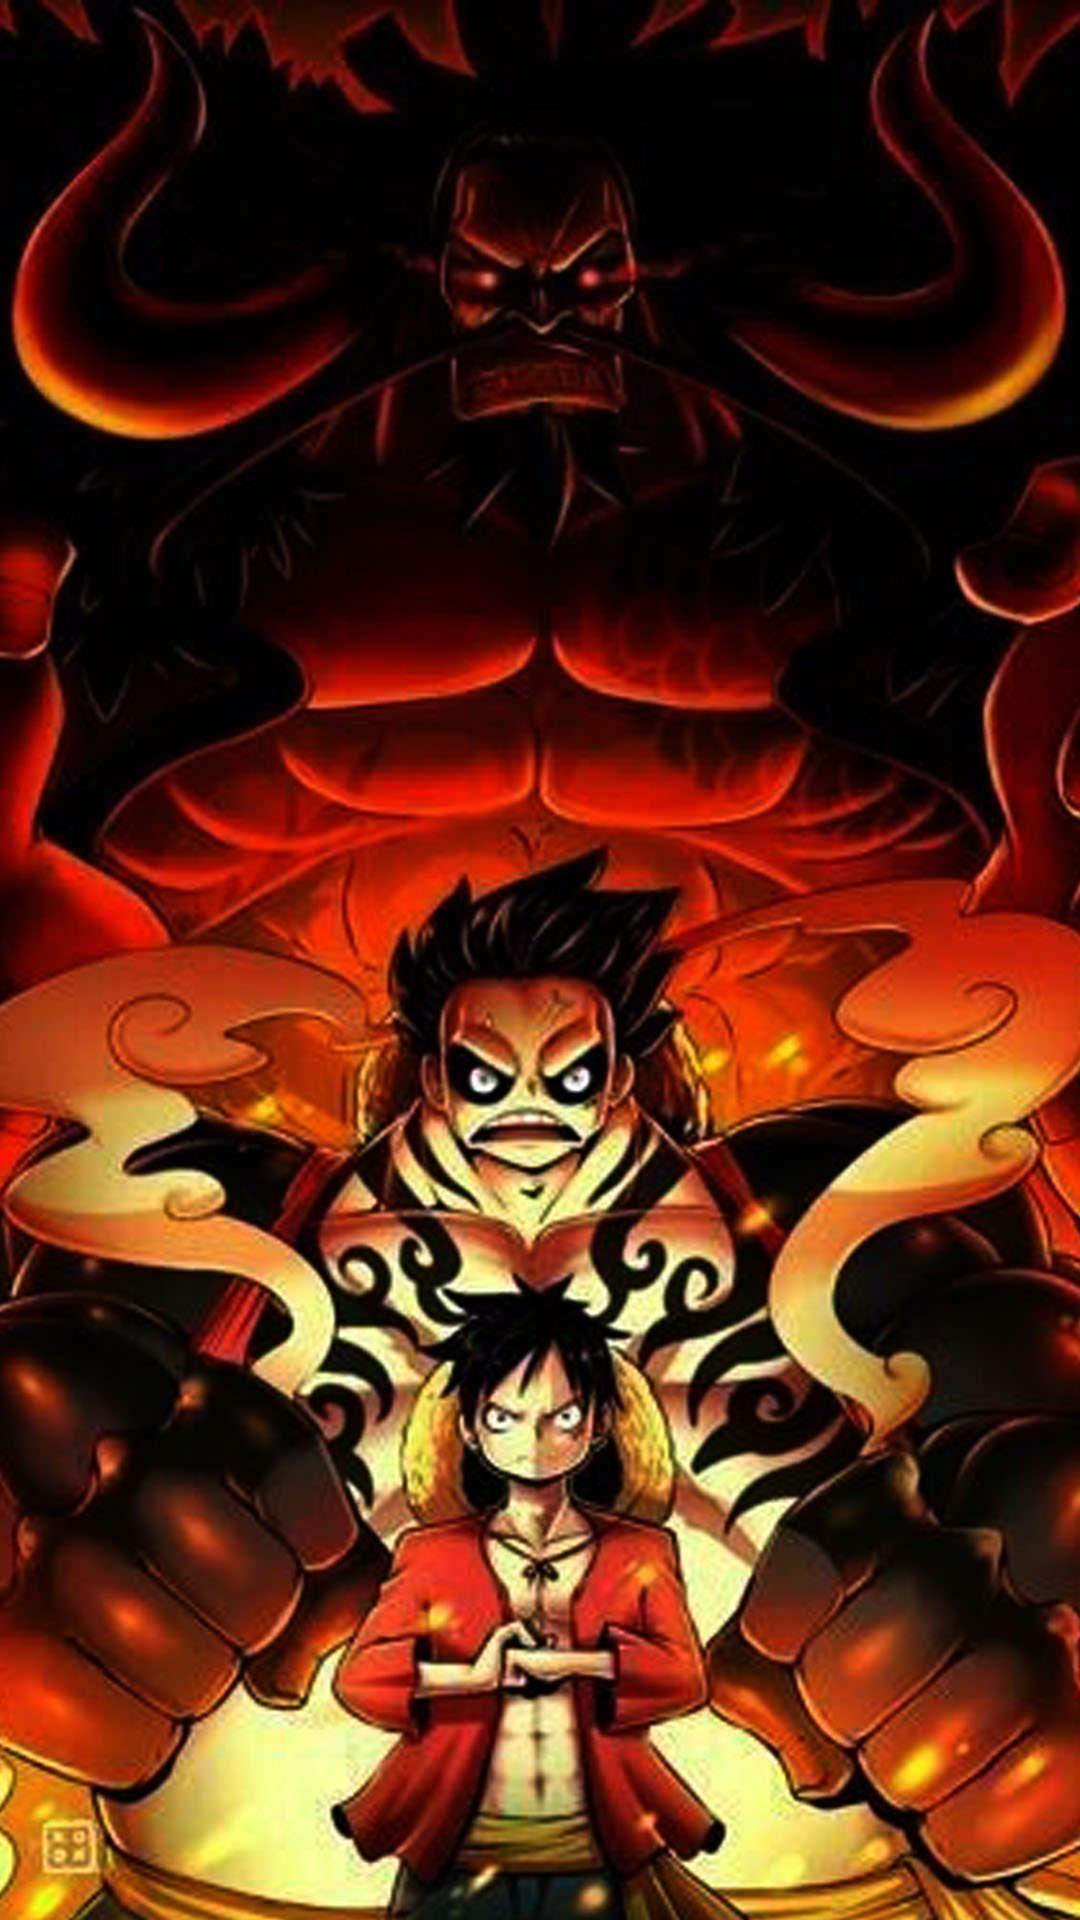 Kaido One Piece Wallpapers - Top Free Kaido One Piece ...